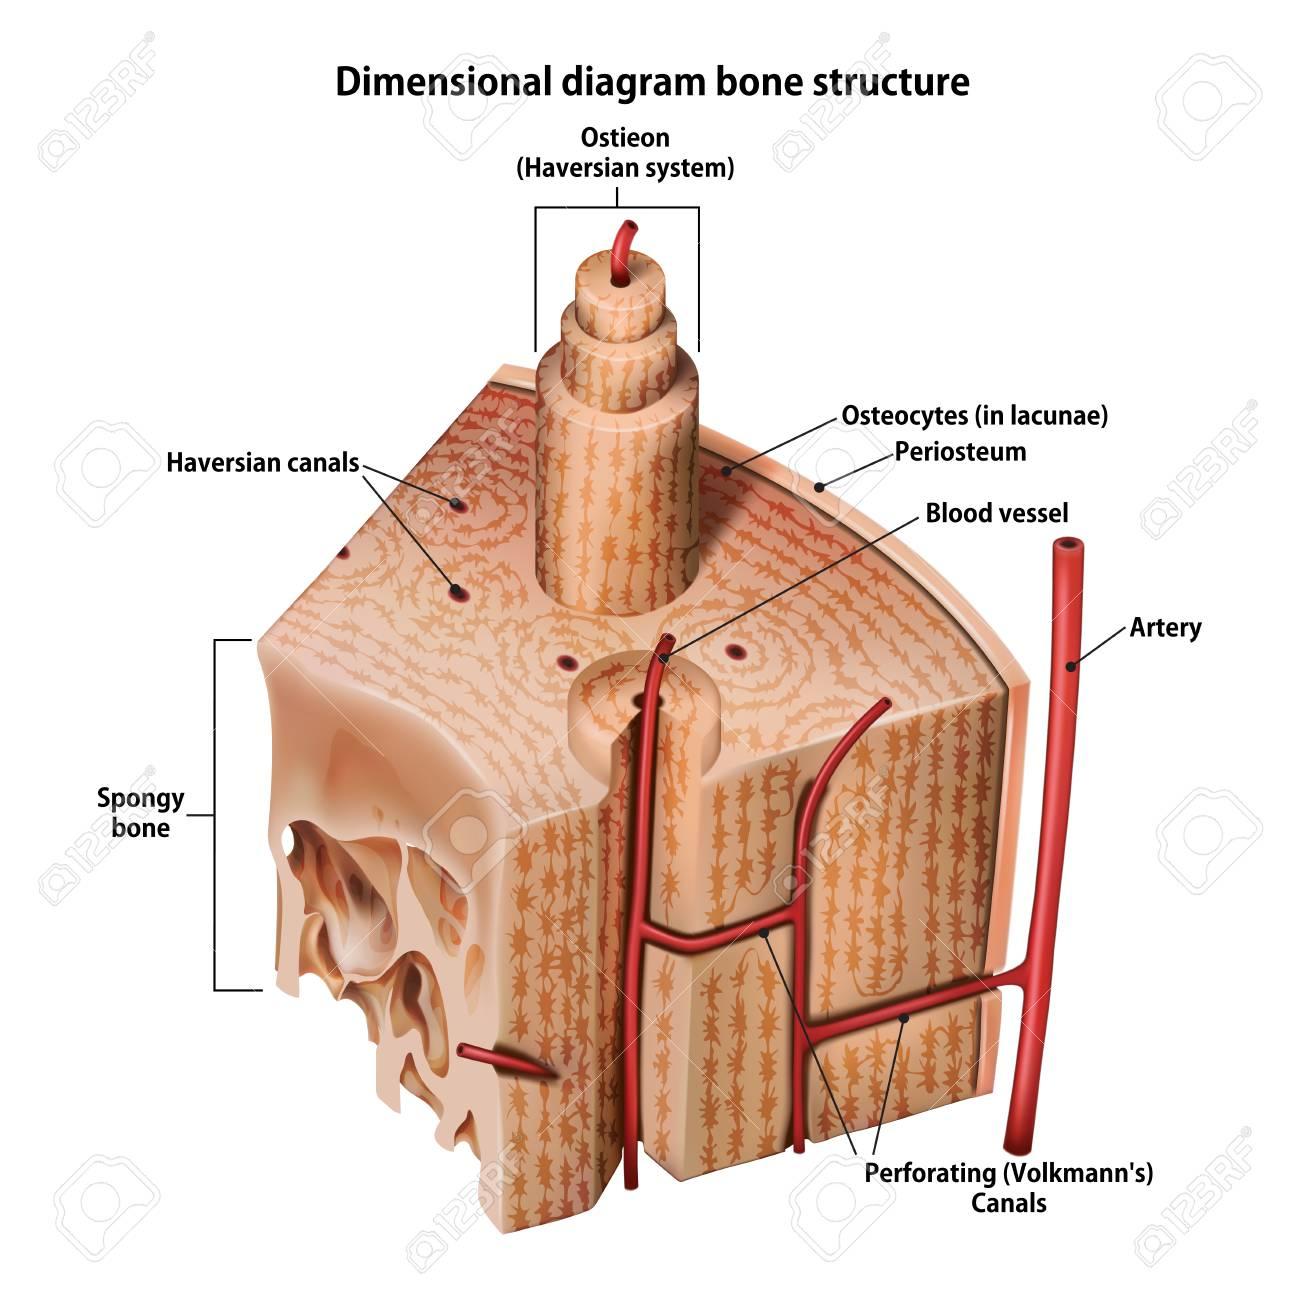 Bone Structure Diagram Manual E Books Railex 120 Volt Single Phase Motor Wiring Diagrams Three Dimensional Royalty Free Clipartsthree Stock Vector 102959492